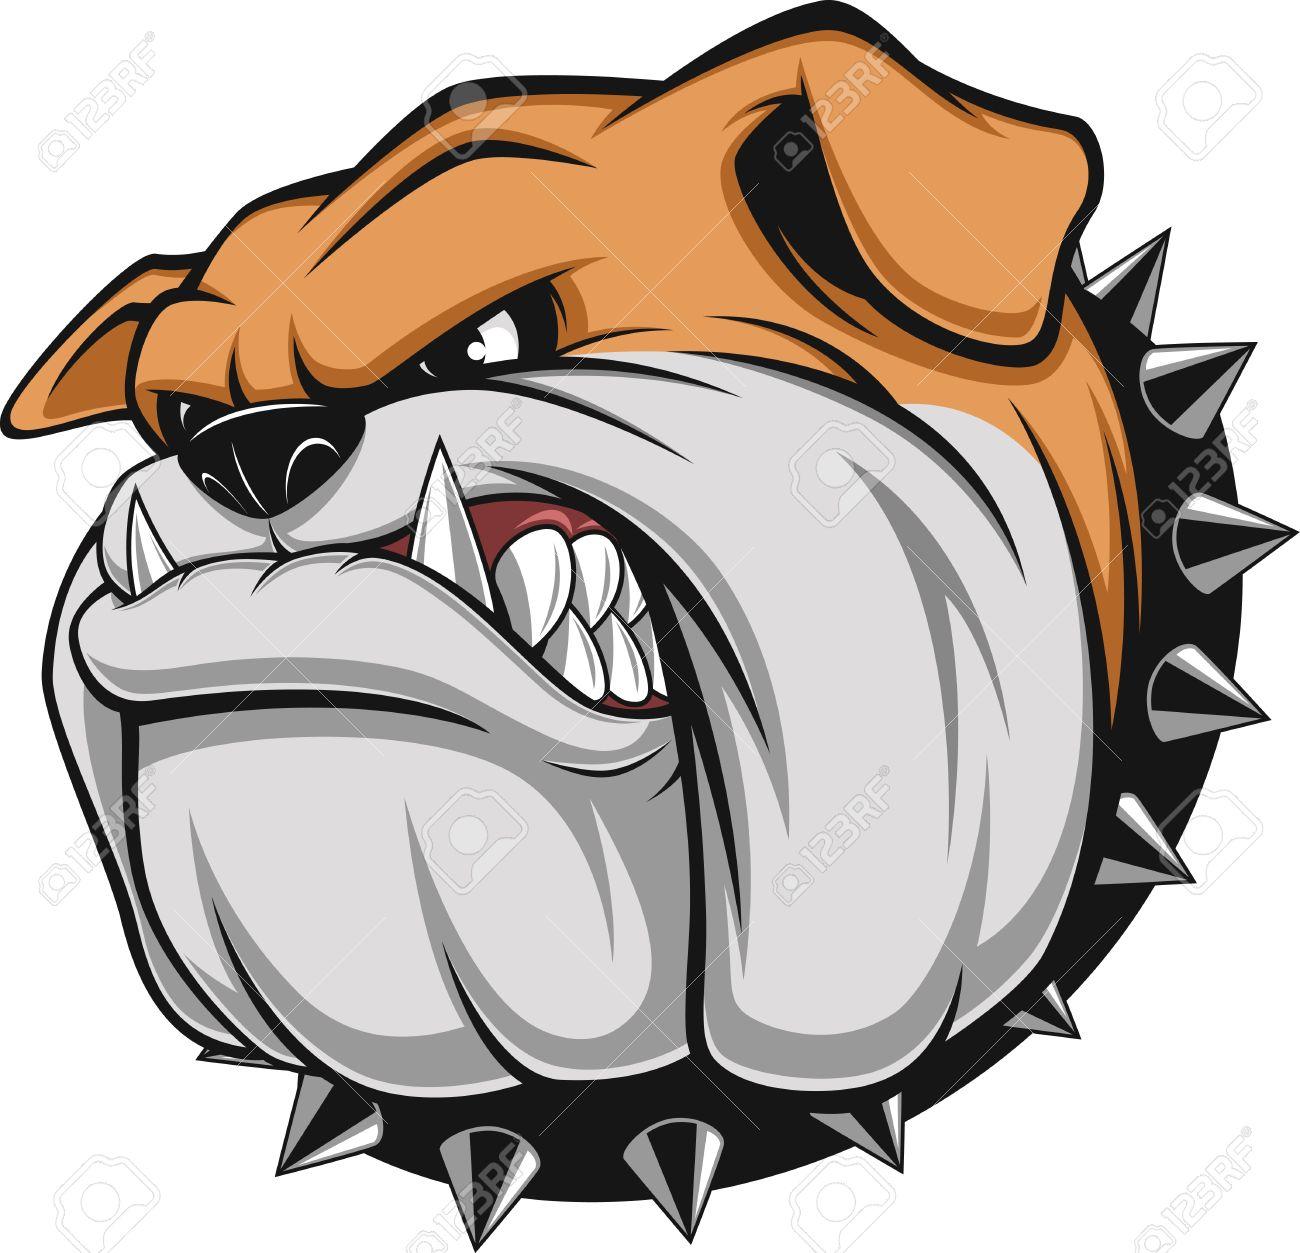 the british bulldogs mascot matilda items in the old wwf magaizine